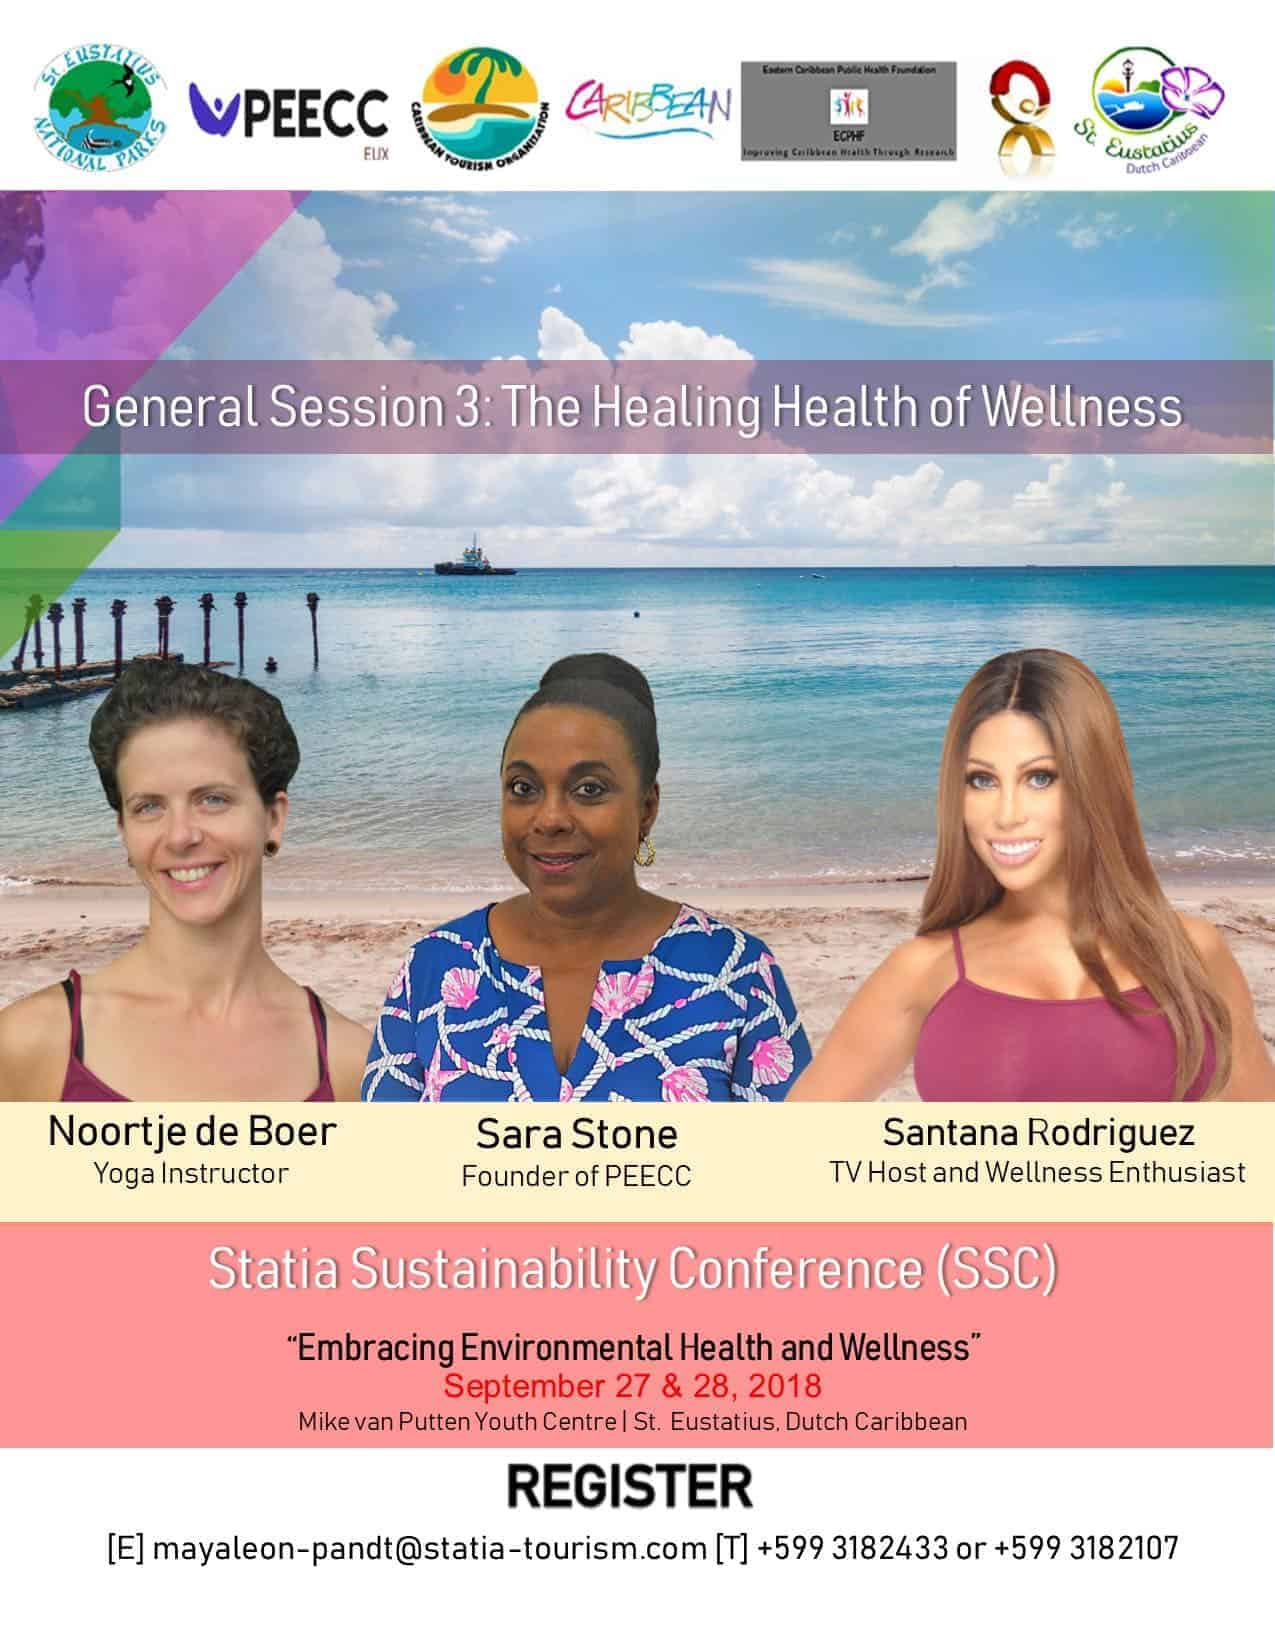 Santana Rodriguez TV Host Wellness Enthusiast